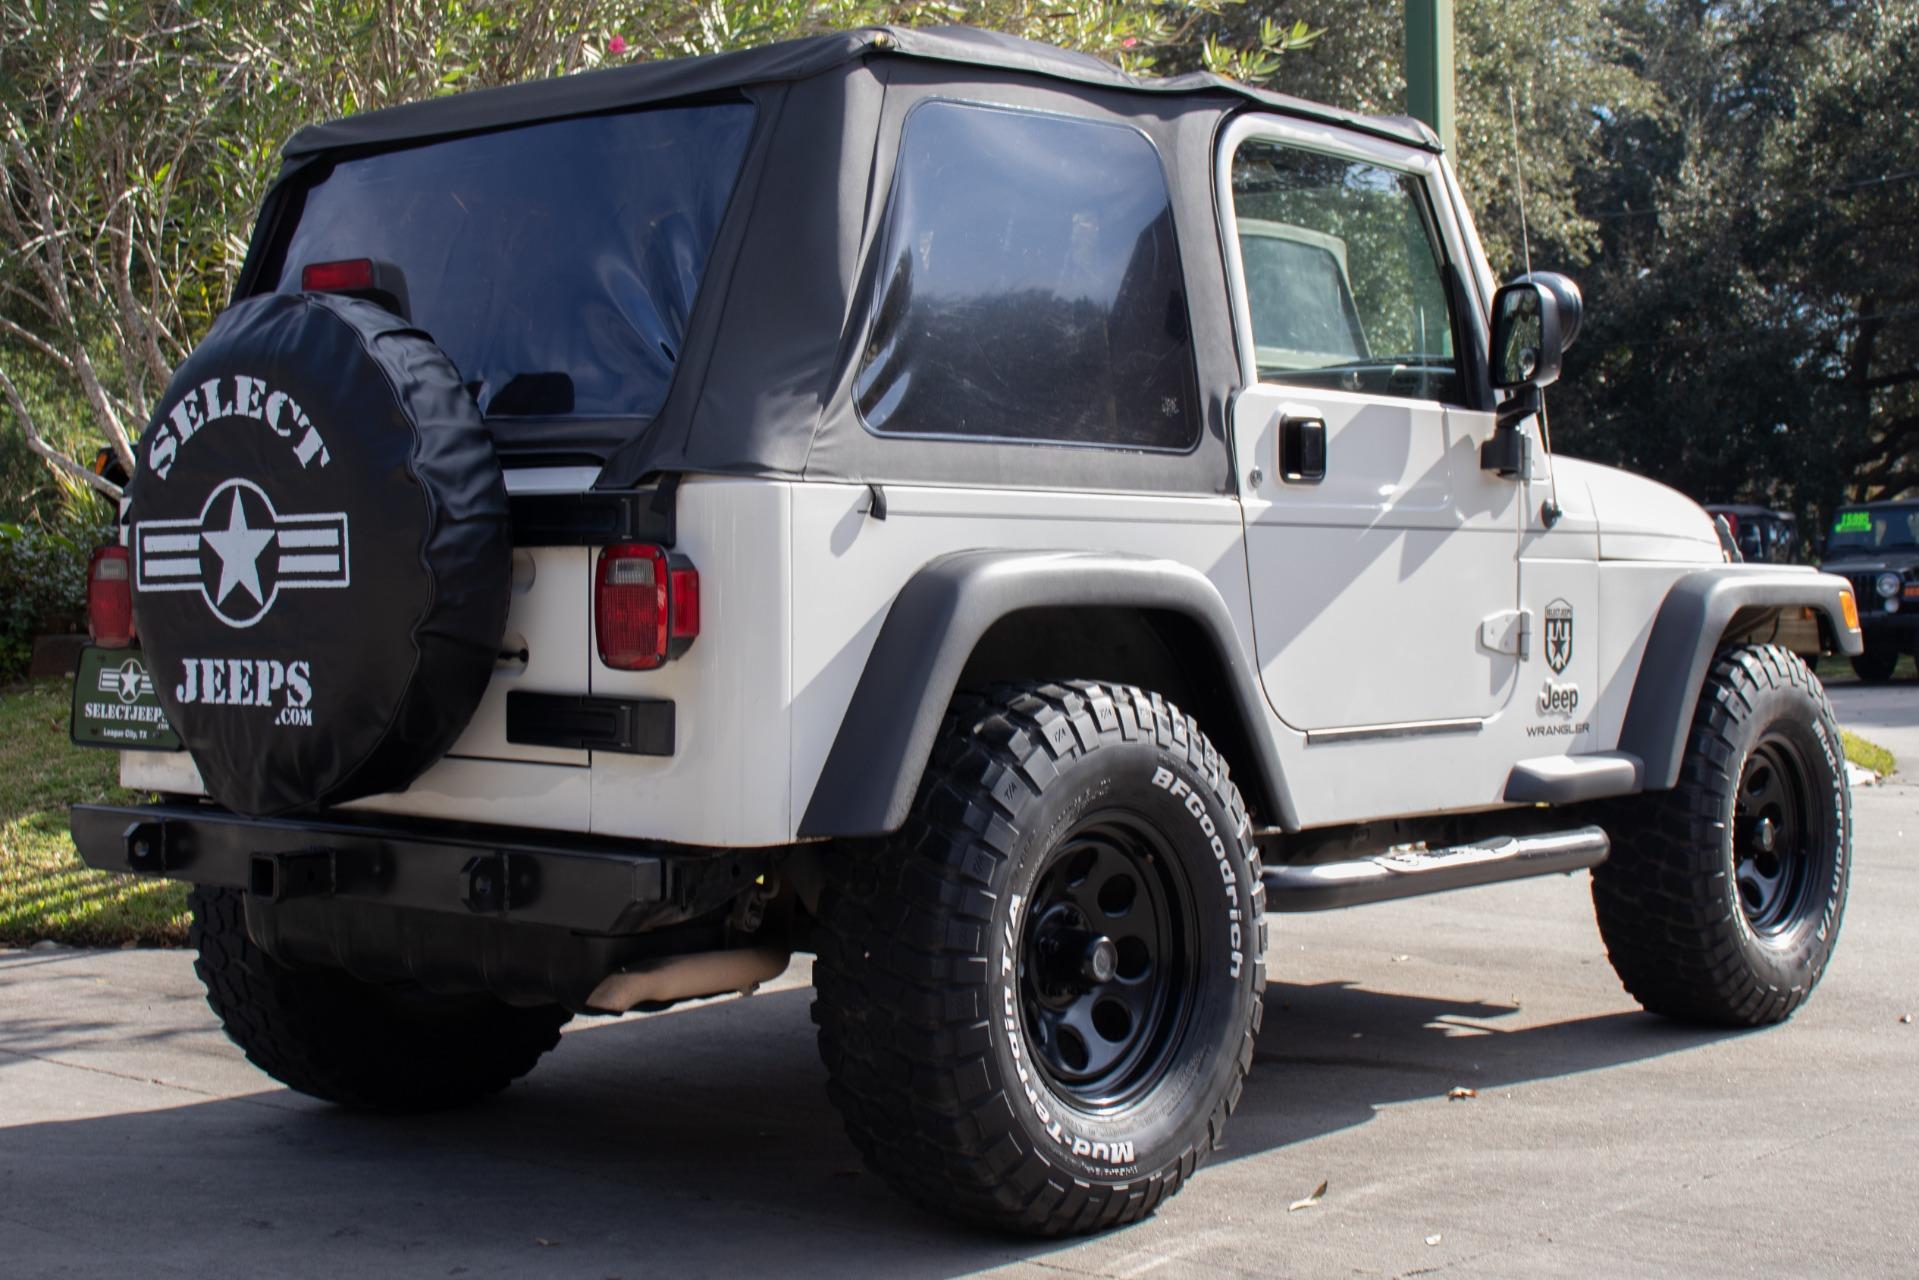 Used-2005-Jeep-Wrangler-SE